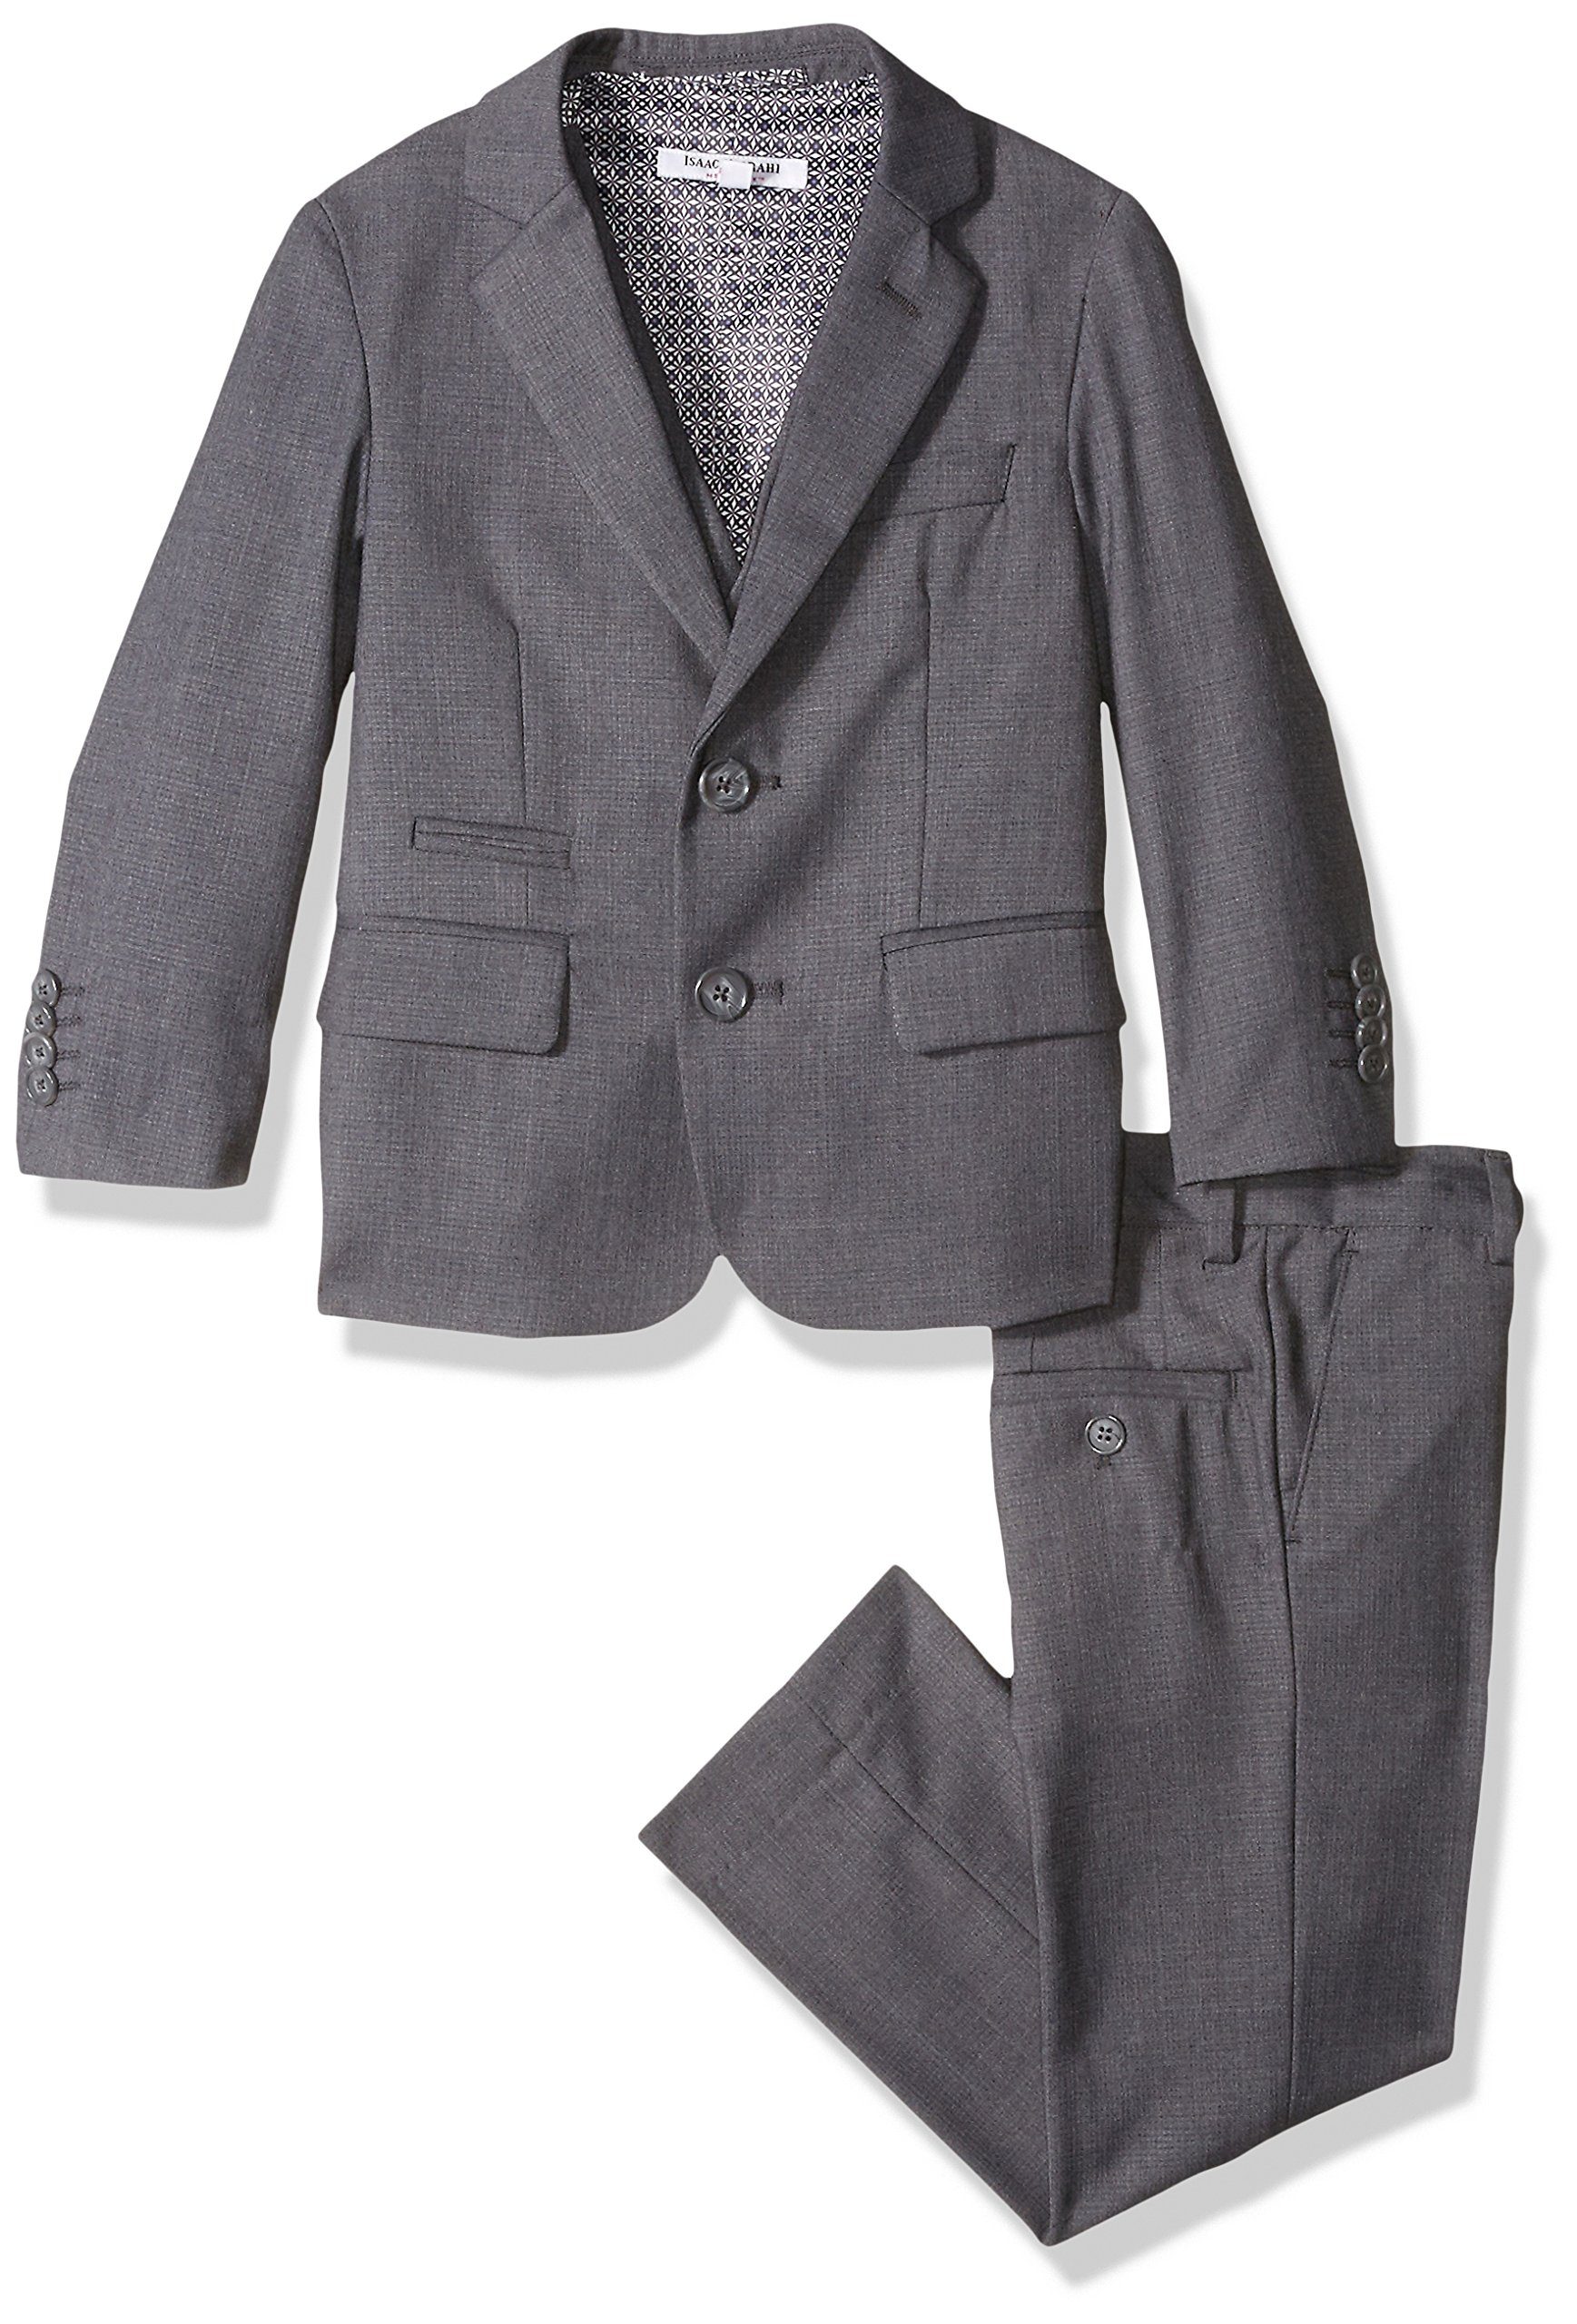 Isaac Mizrahi Big Boys' Textured 3pc Solid Suit, Charcoal, 18 by Isaac Mizrahi